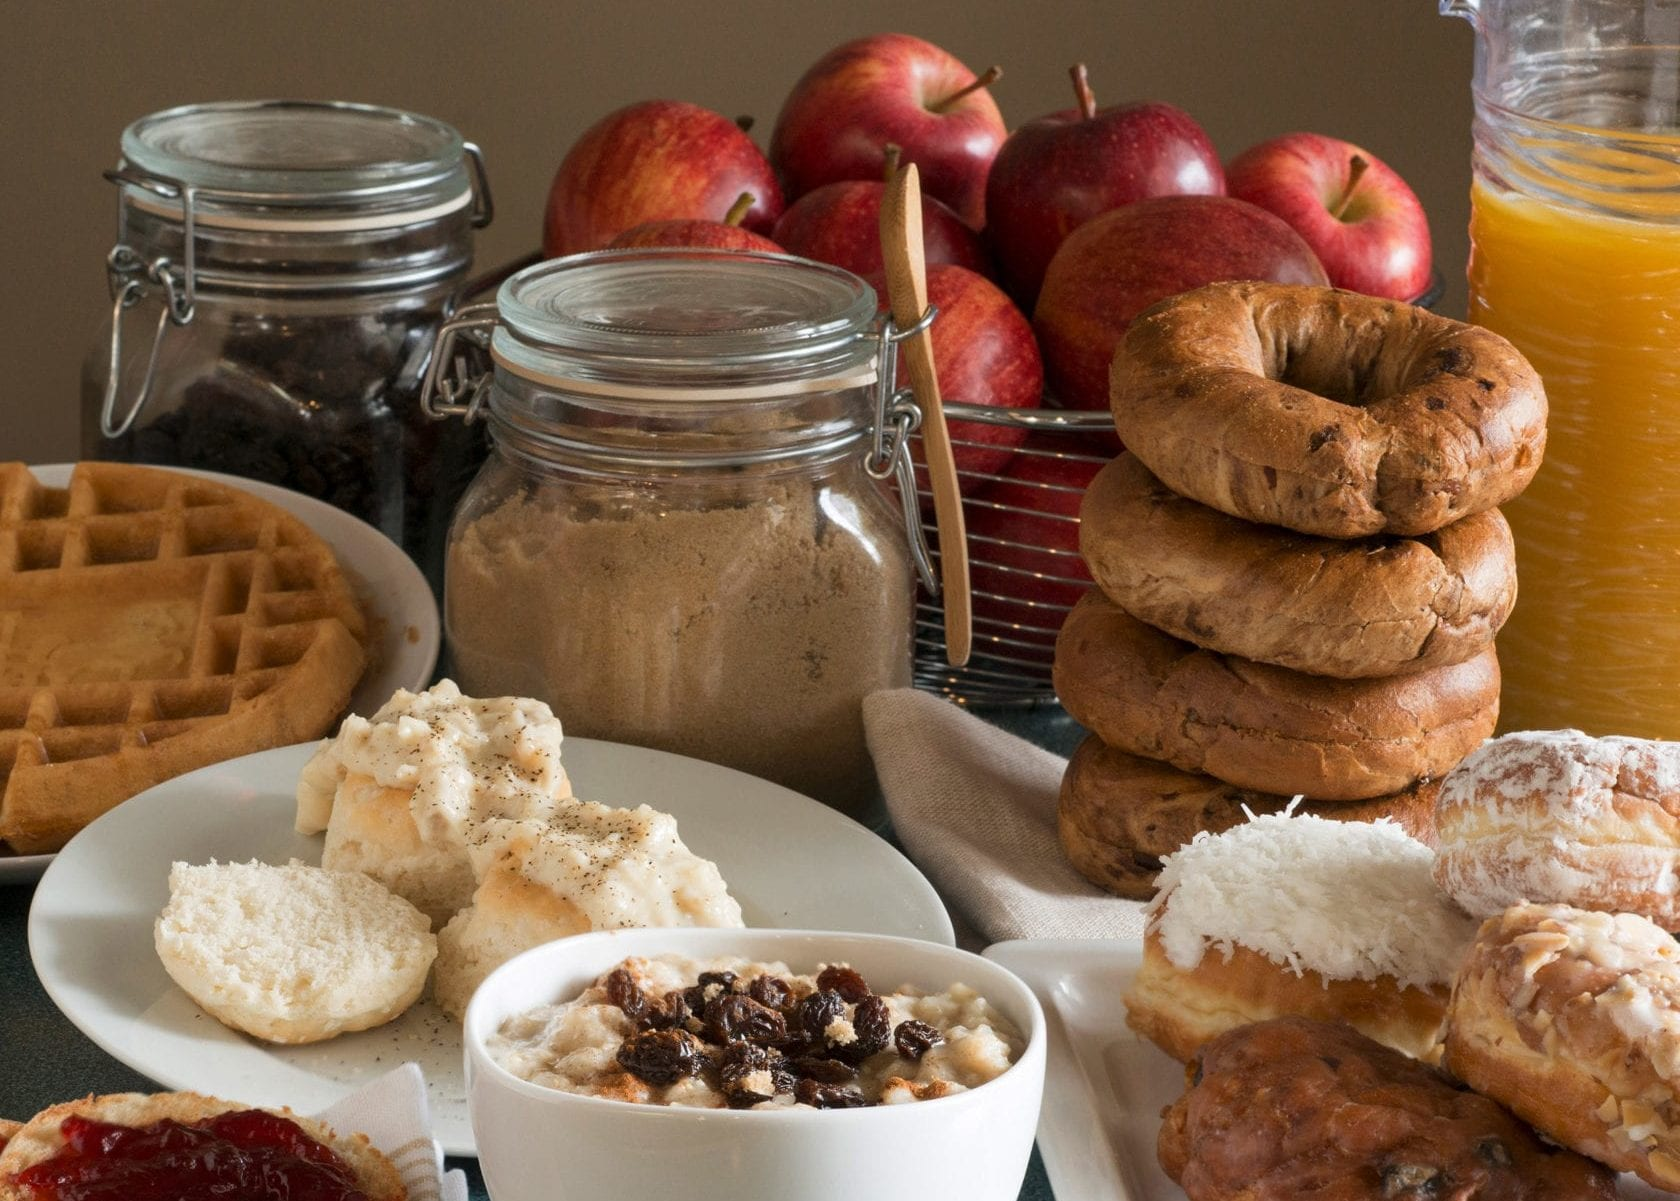 Breakfast spread at Travelers Rest Motel in Bird-in-Hand